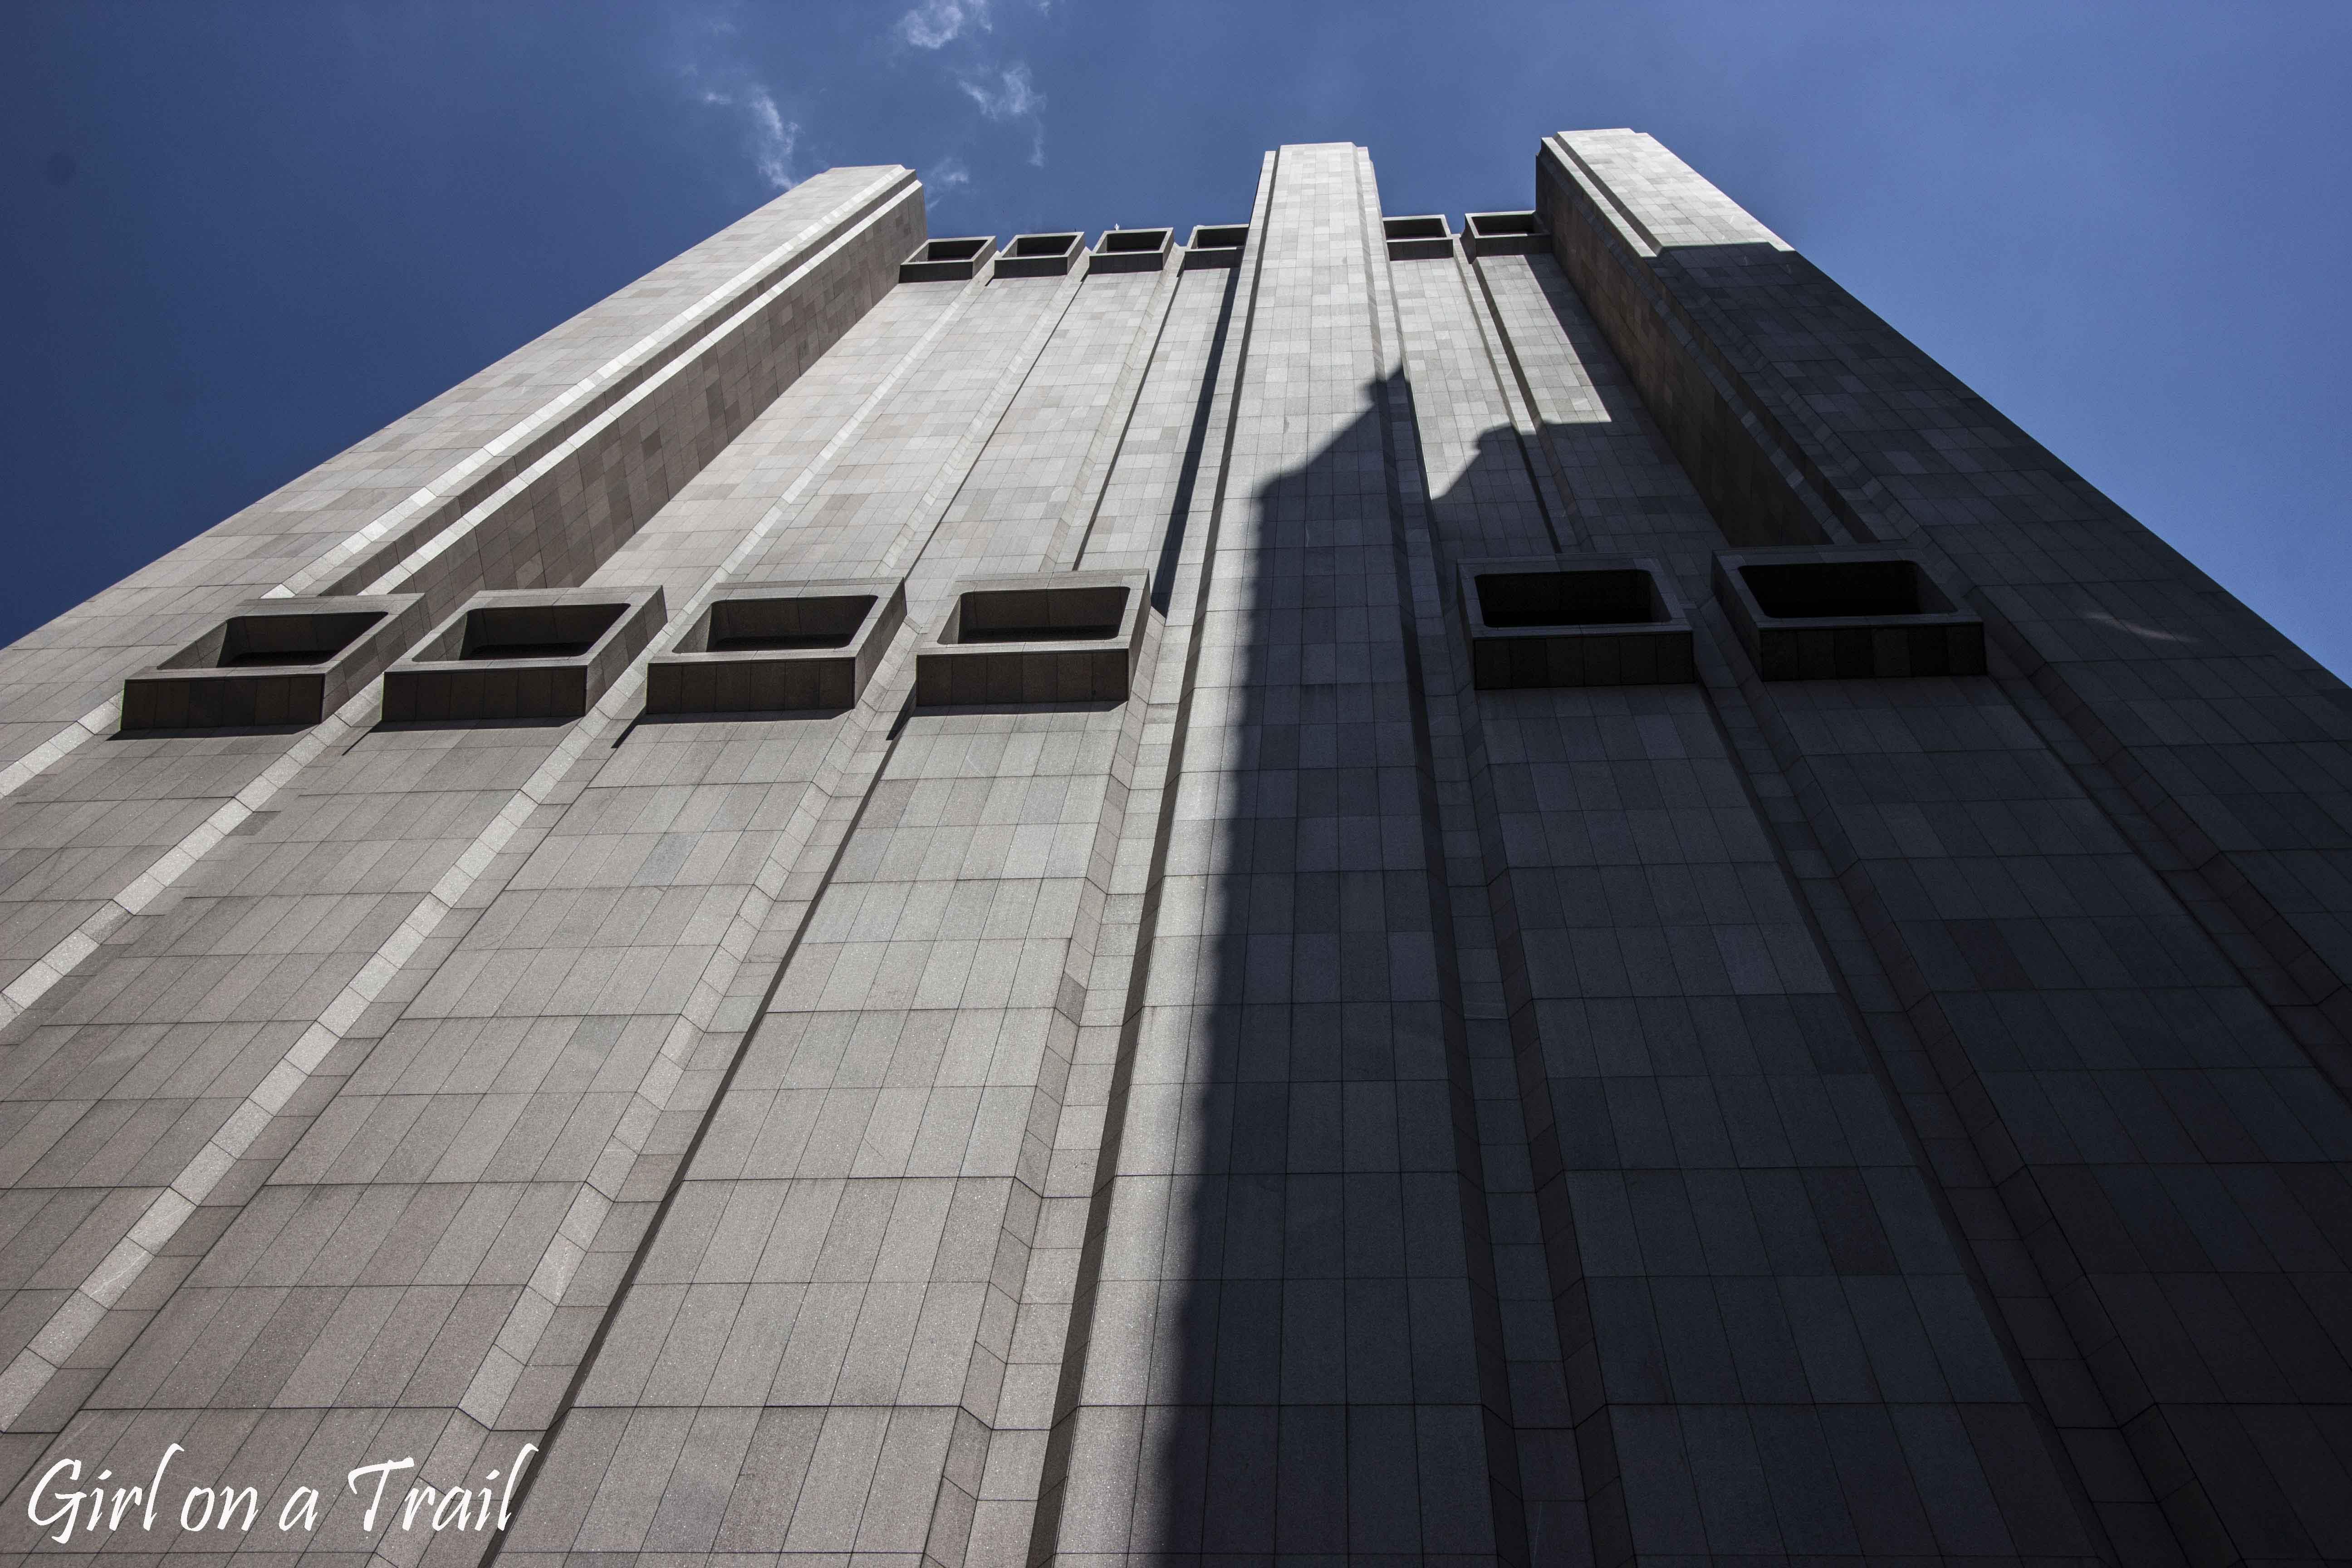 Nowy Jork - Long Lines Building